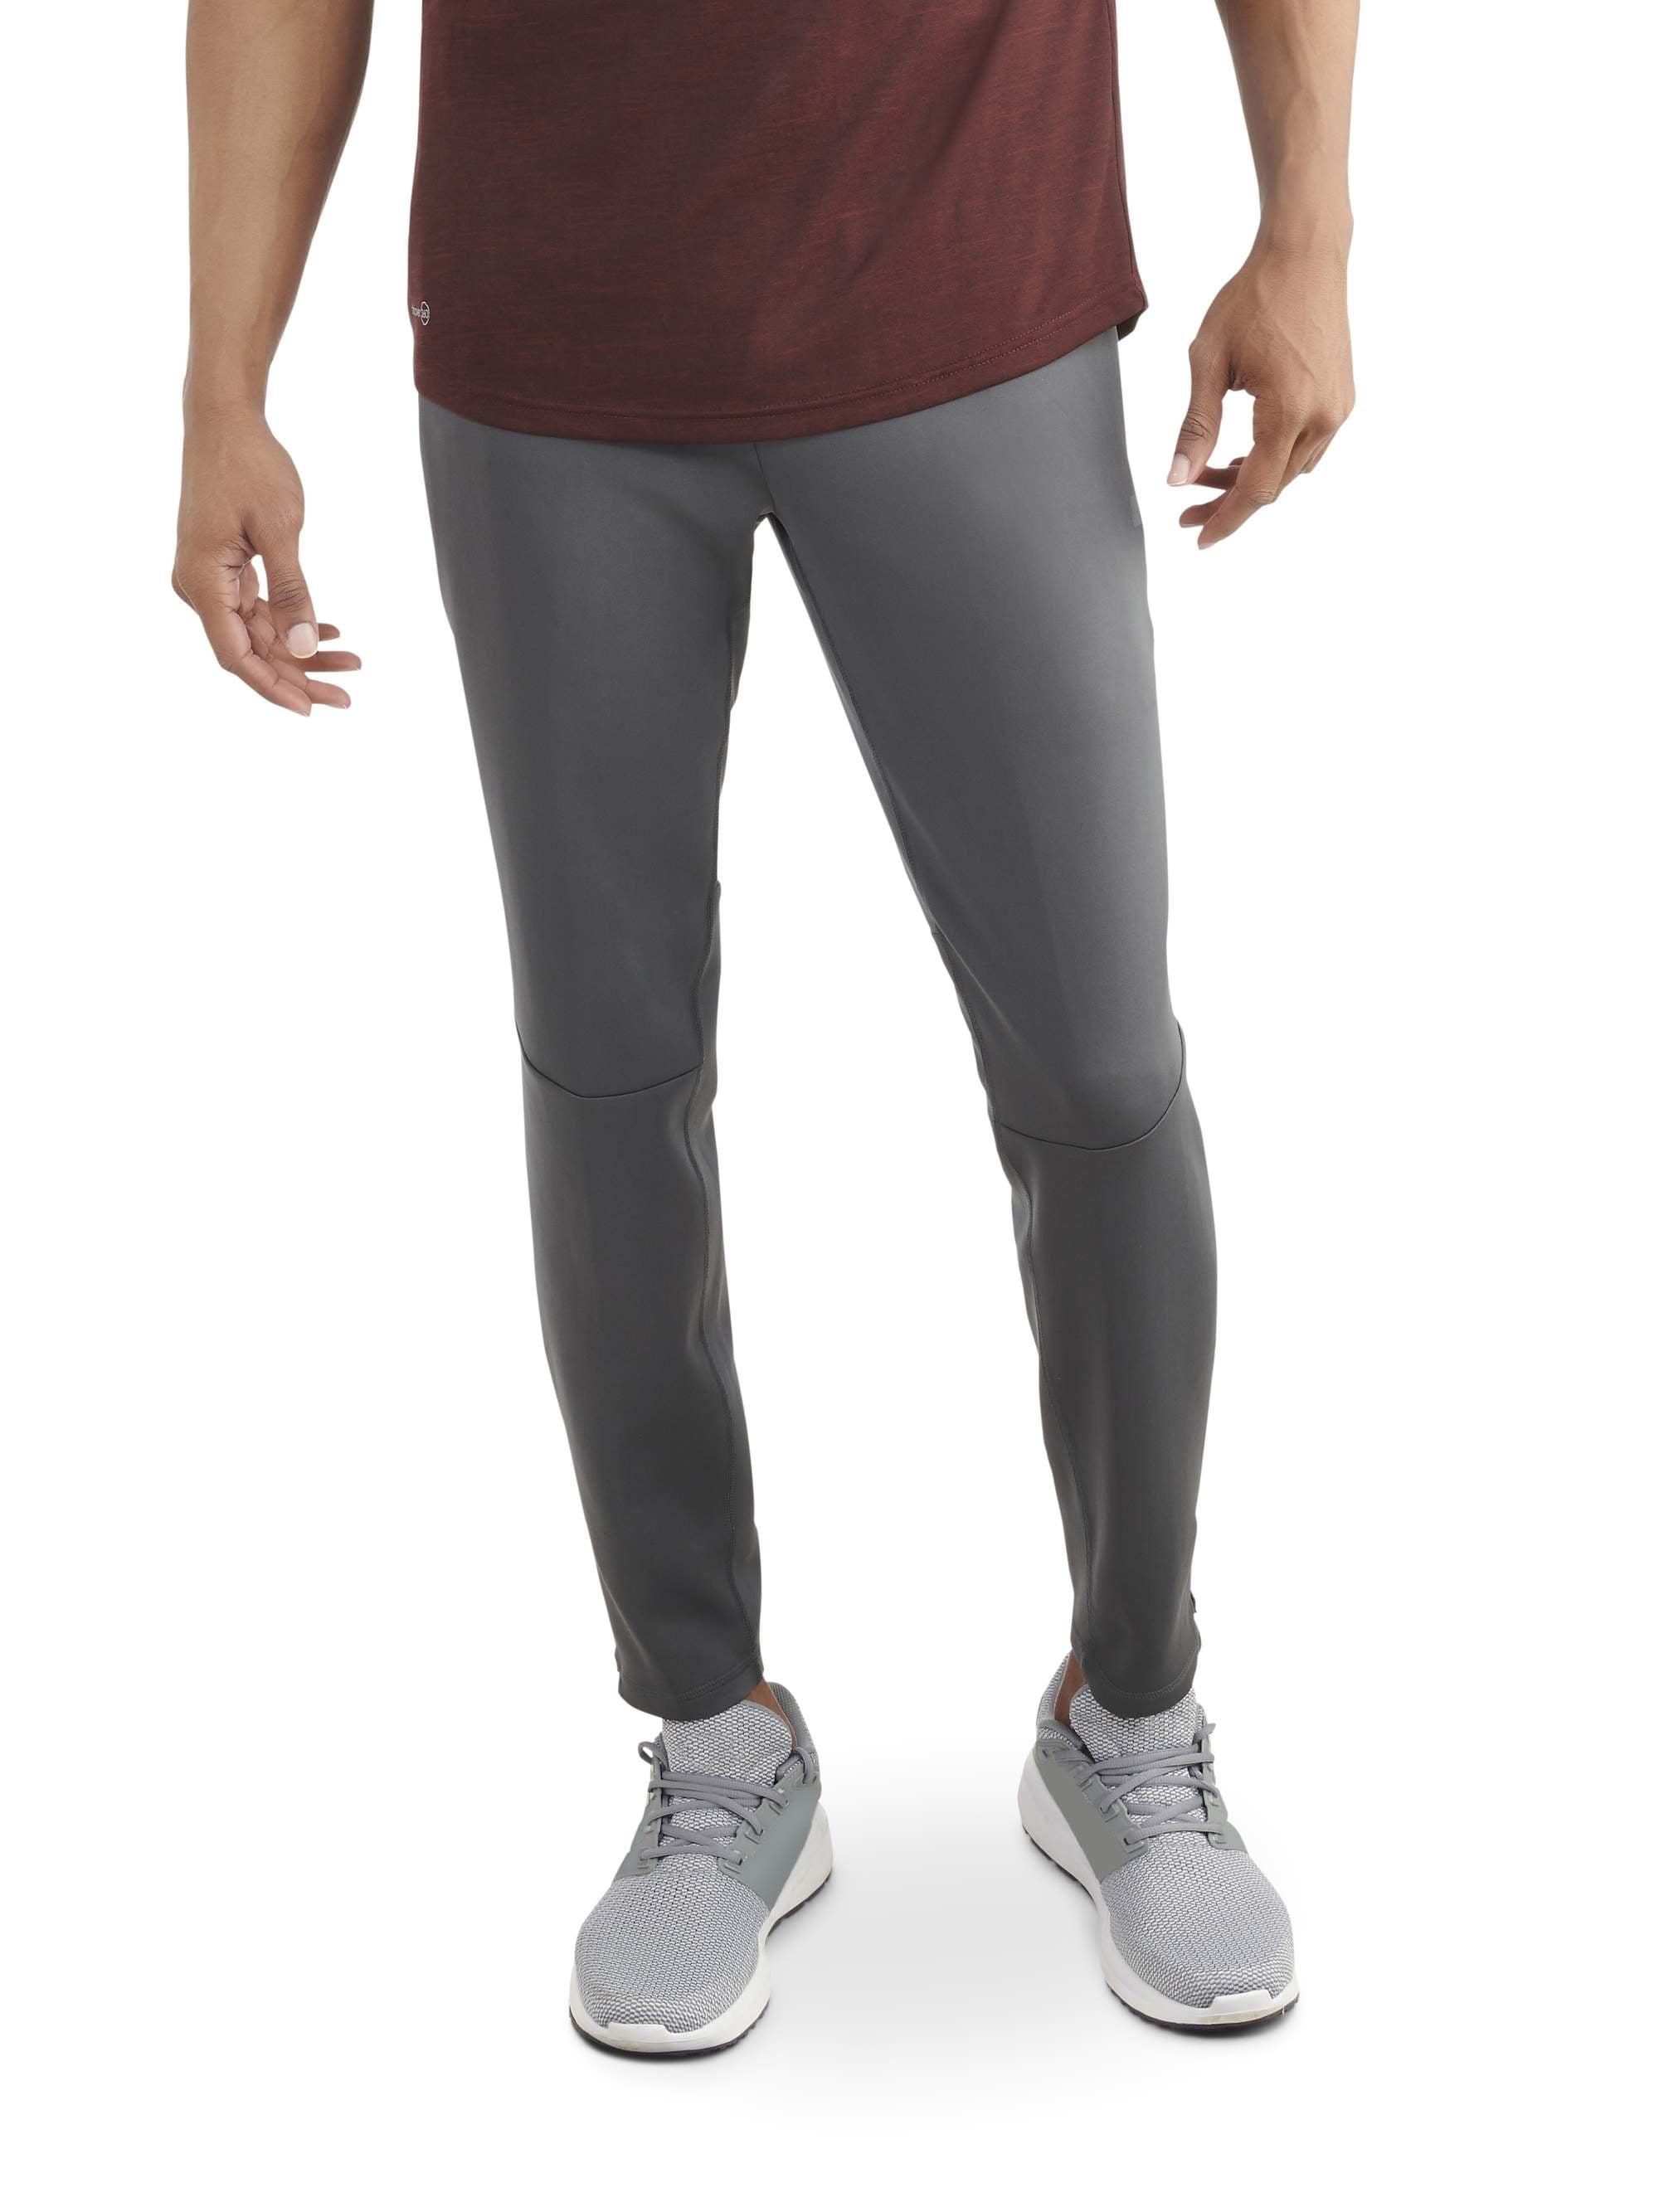 7d6cad6b Men's Slim Performance Knit Pant – Walmart Inventory Checker – BrickSeek